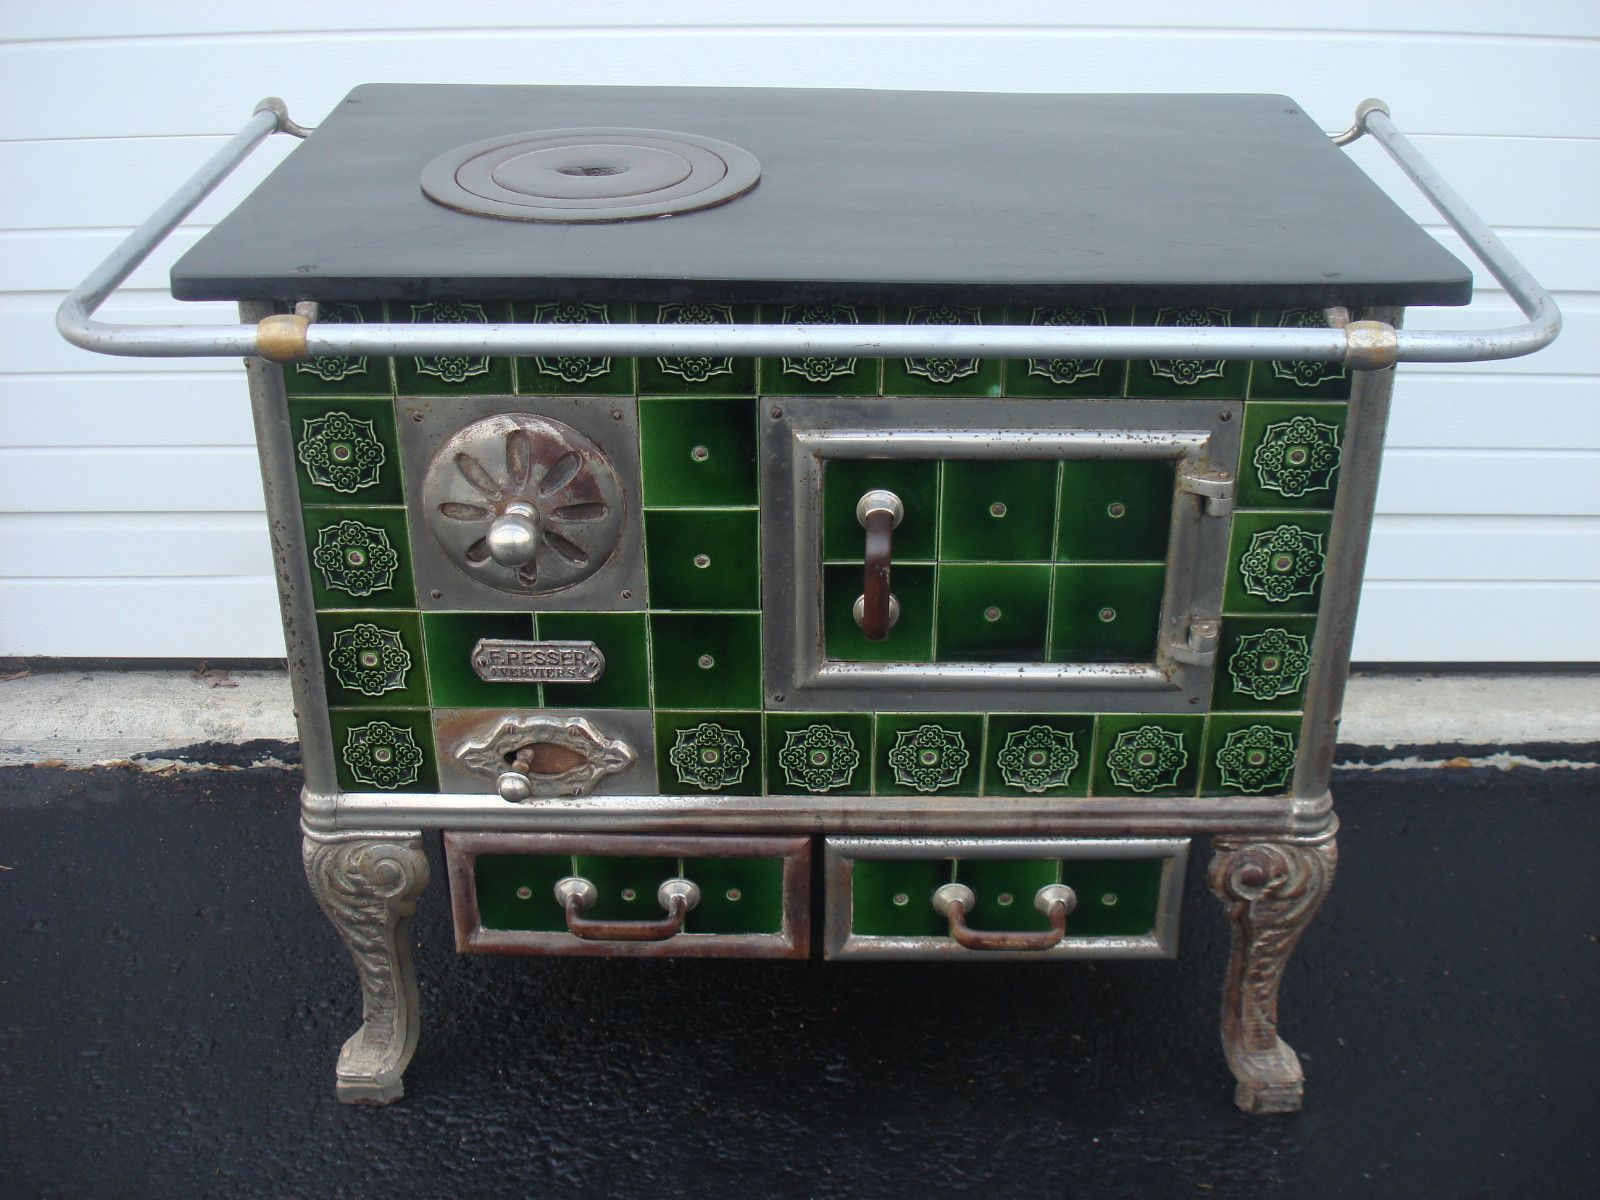 Belgium ceramic tile stove oven cute pinterest stove oven belgium ceramic tile stove oven doublecrazyfo Gallery